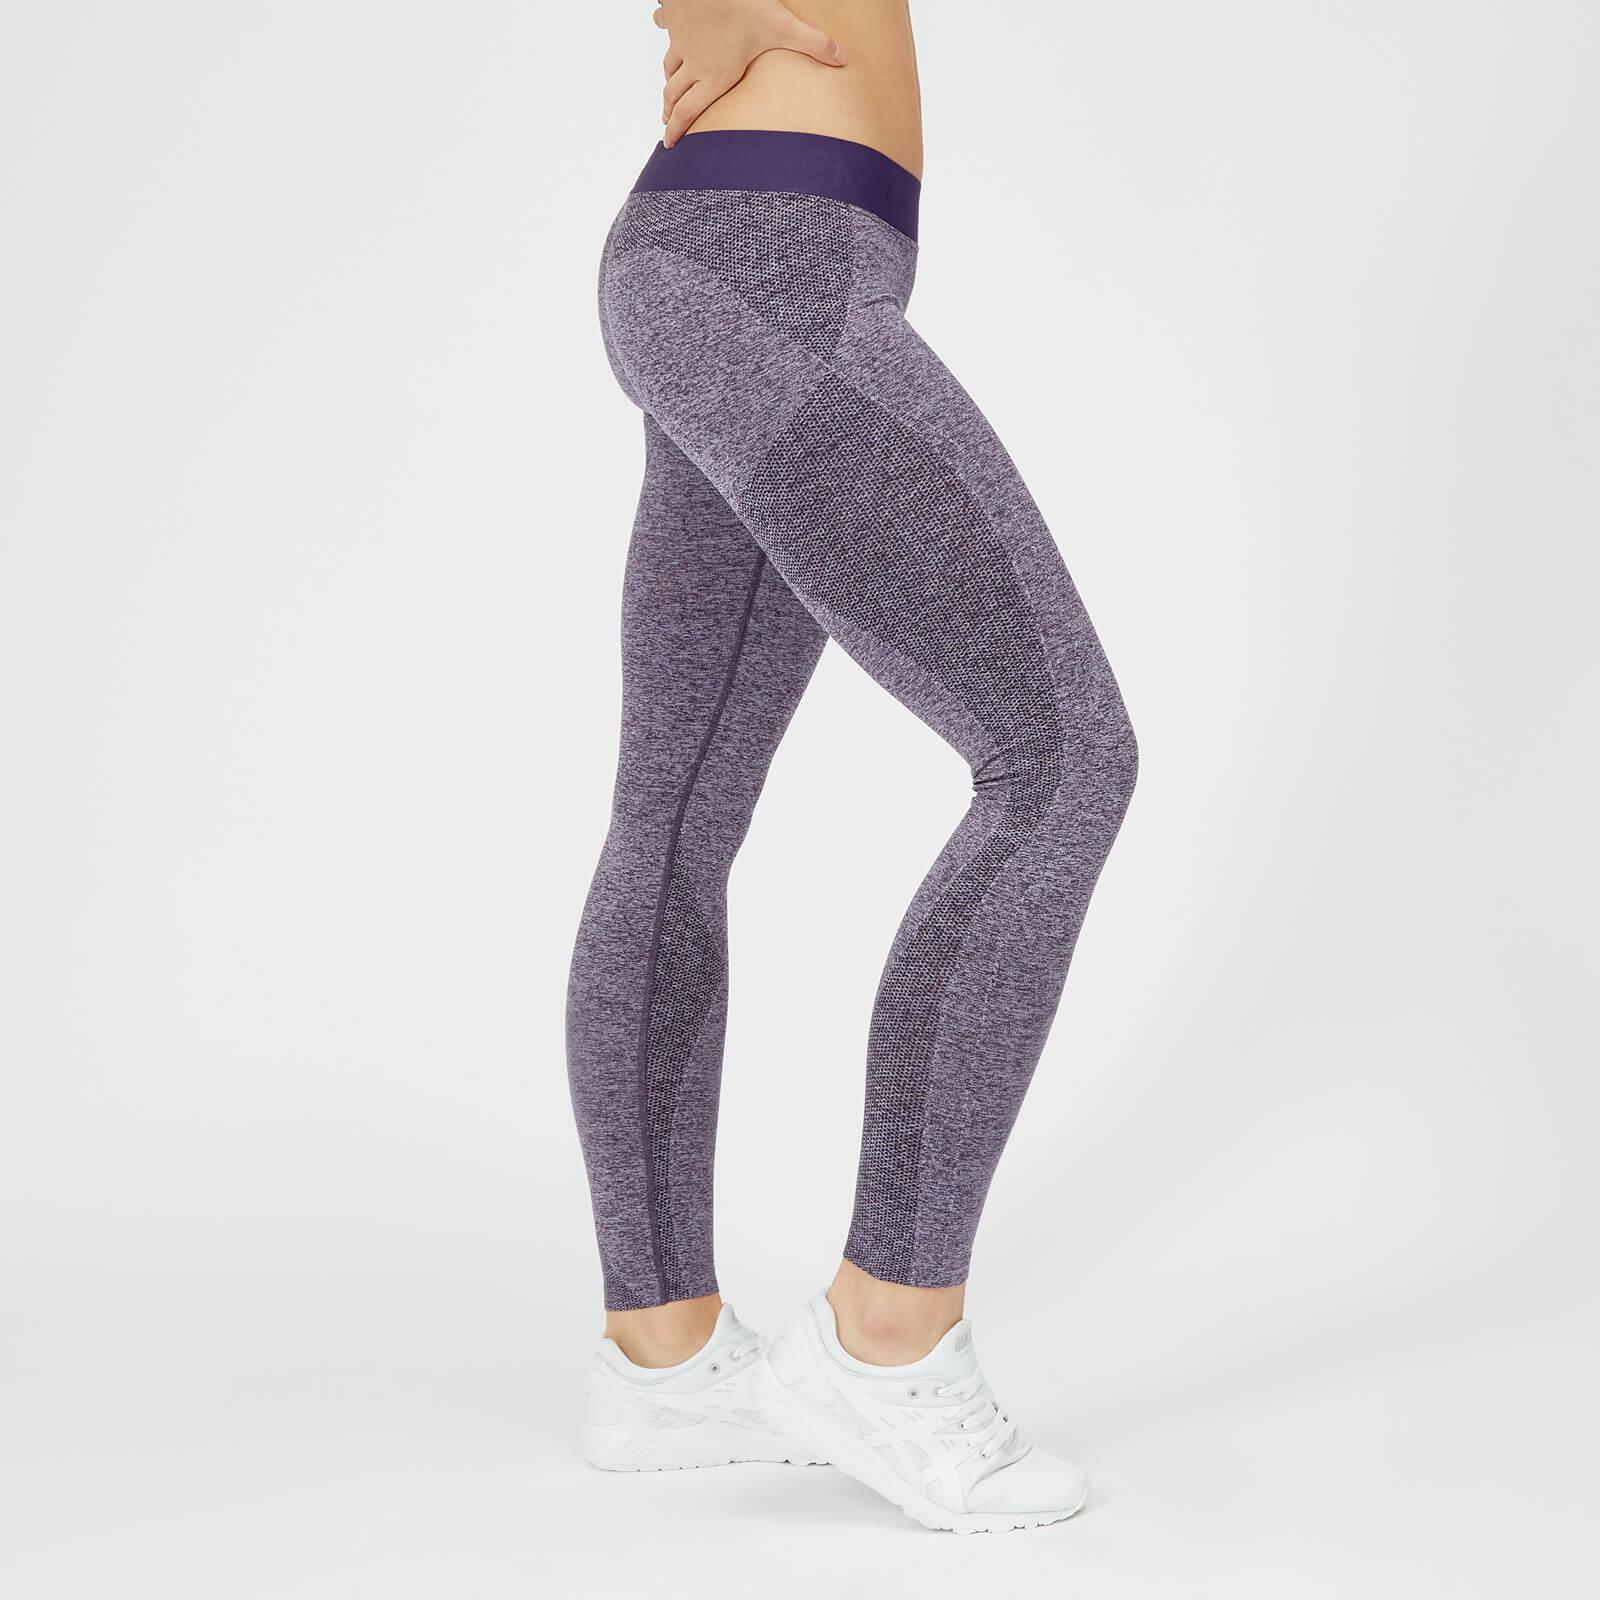 Myprotein Inspire Seamless Leggings - Purple - XS